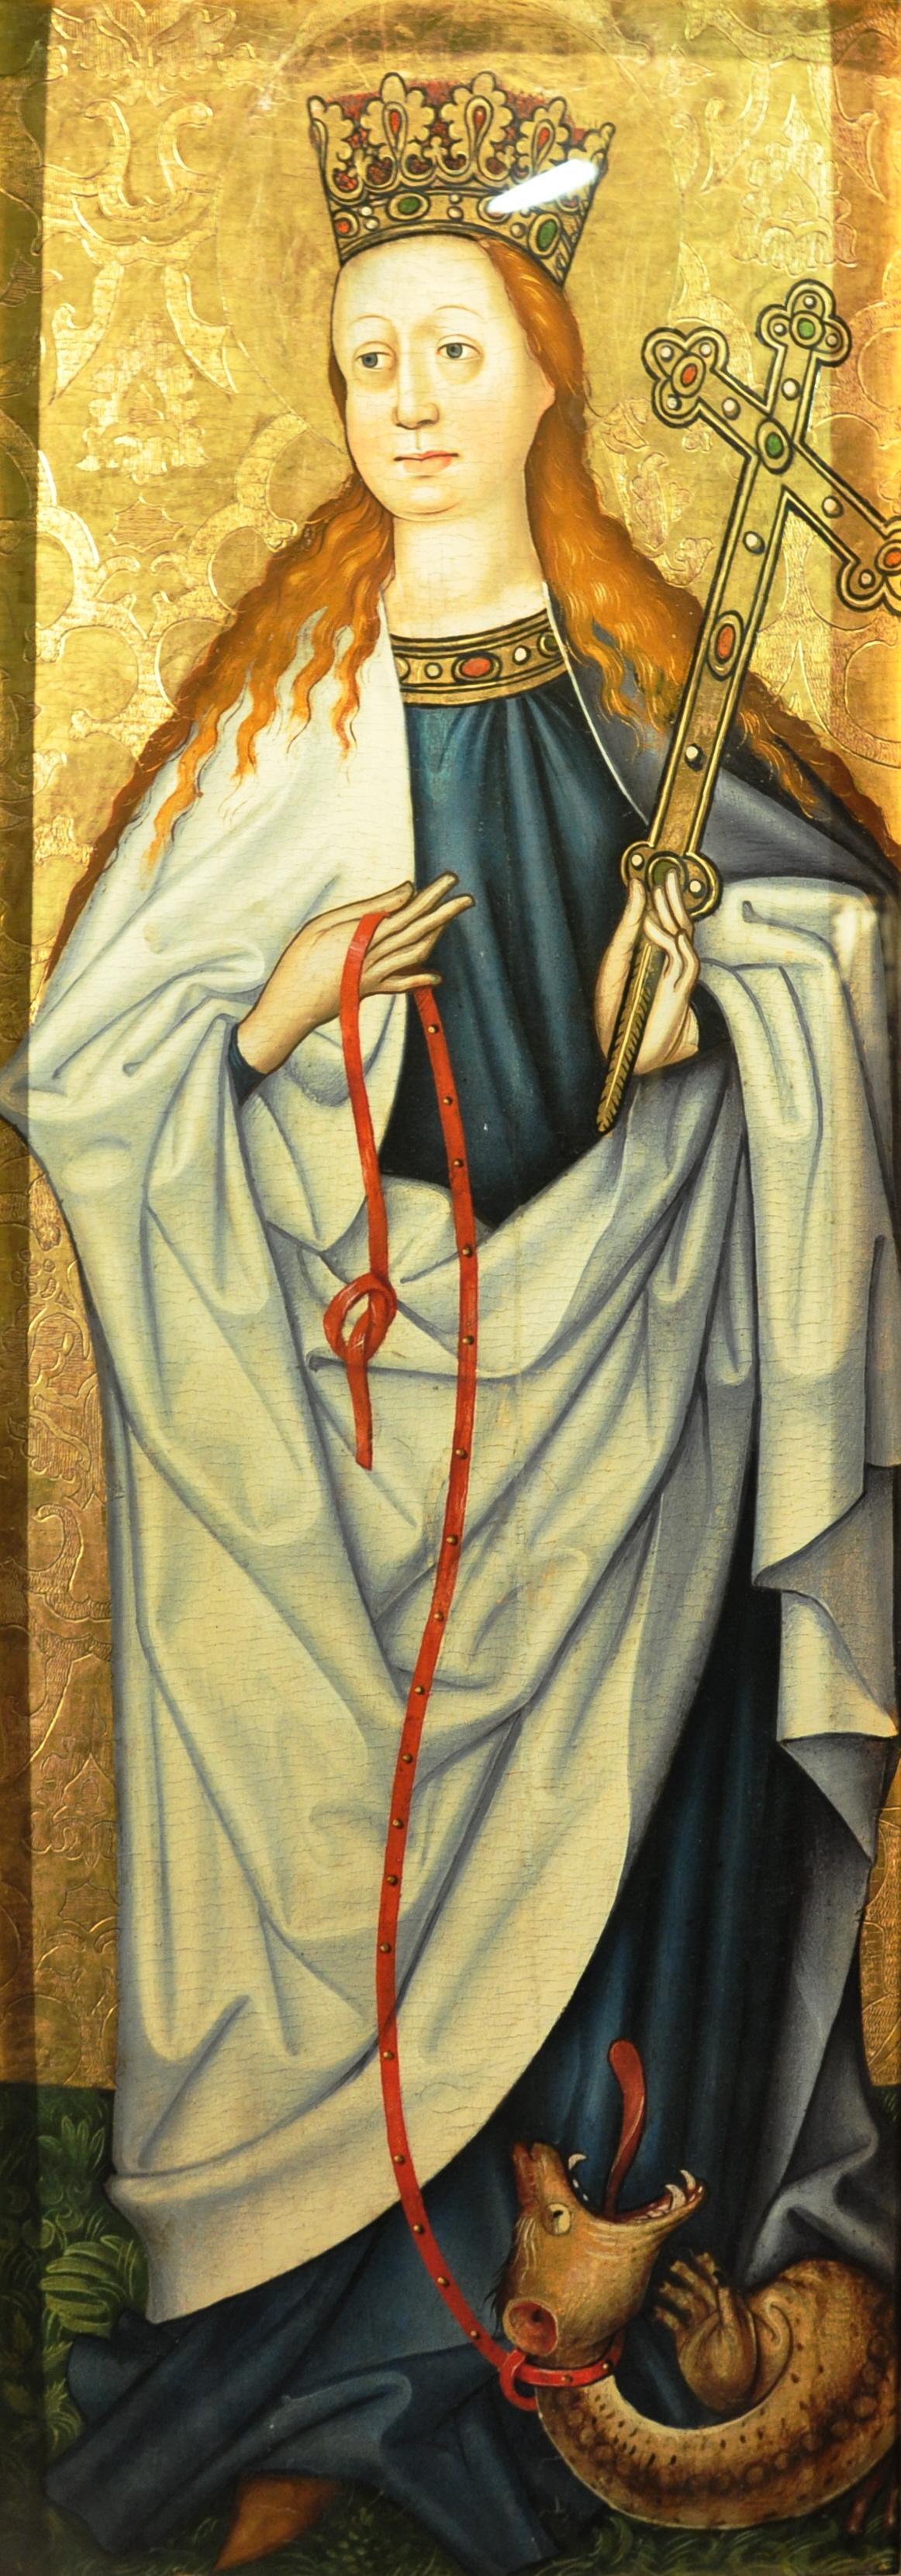 Maestro Tirolese (ca. 1470–1480), privat samling i Wien